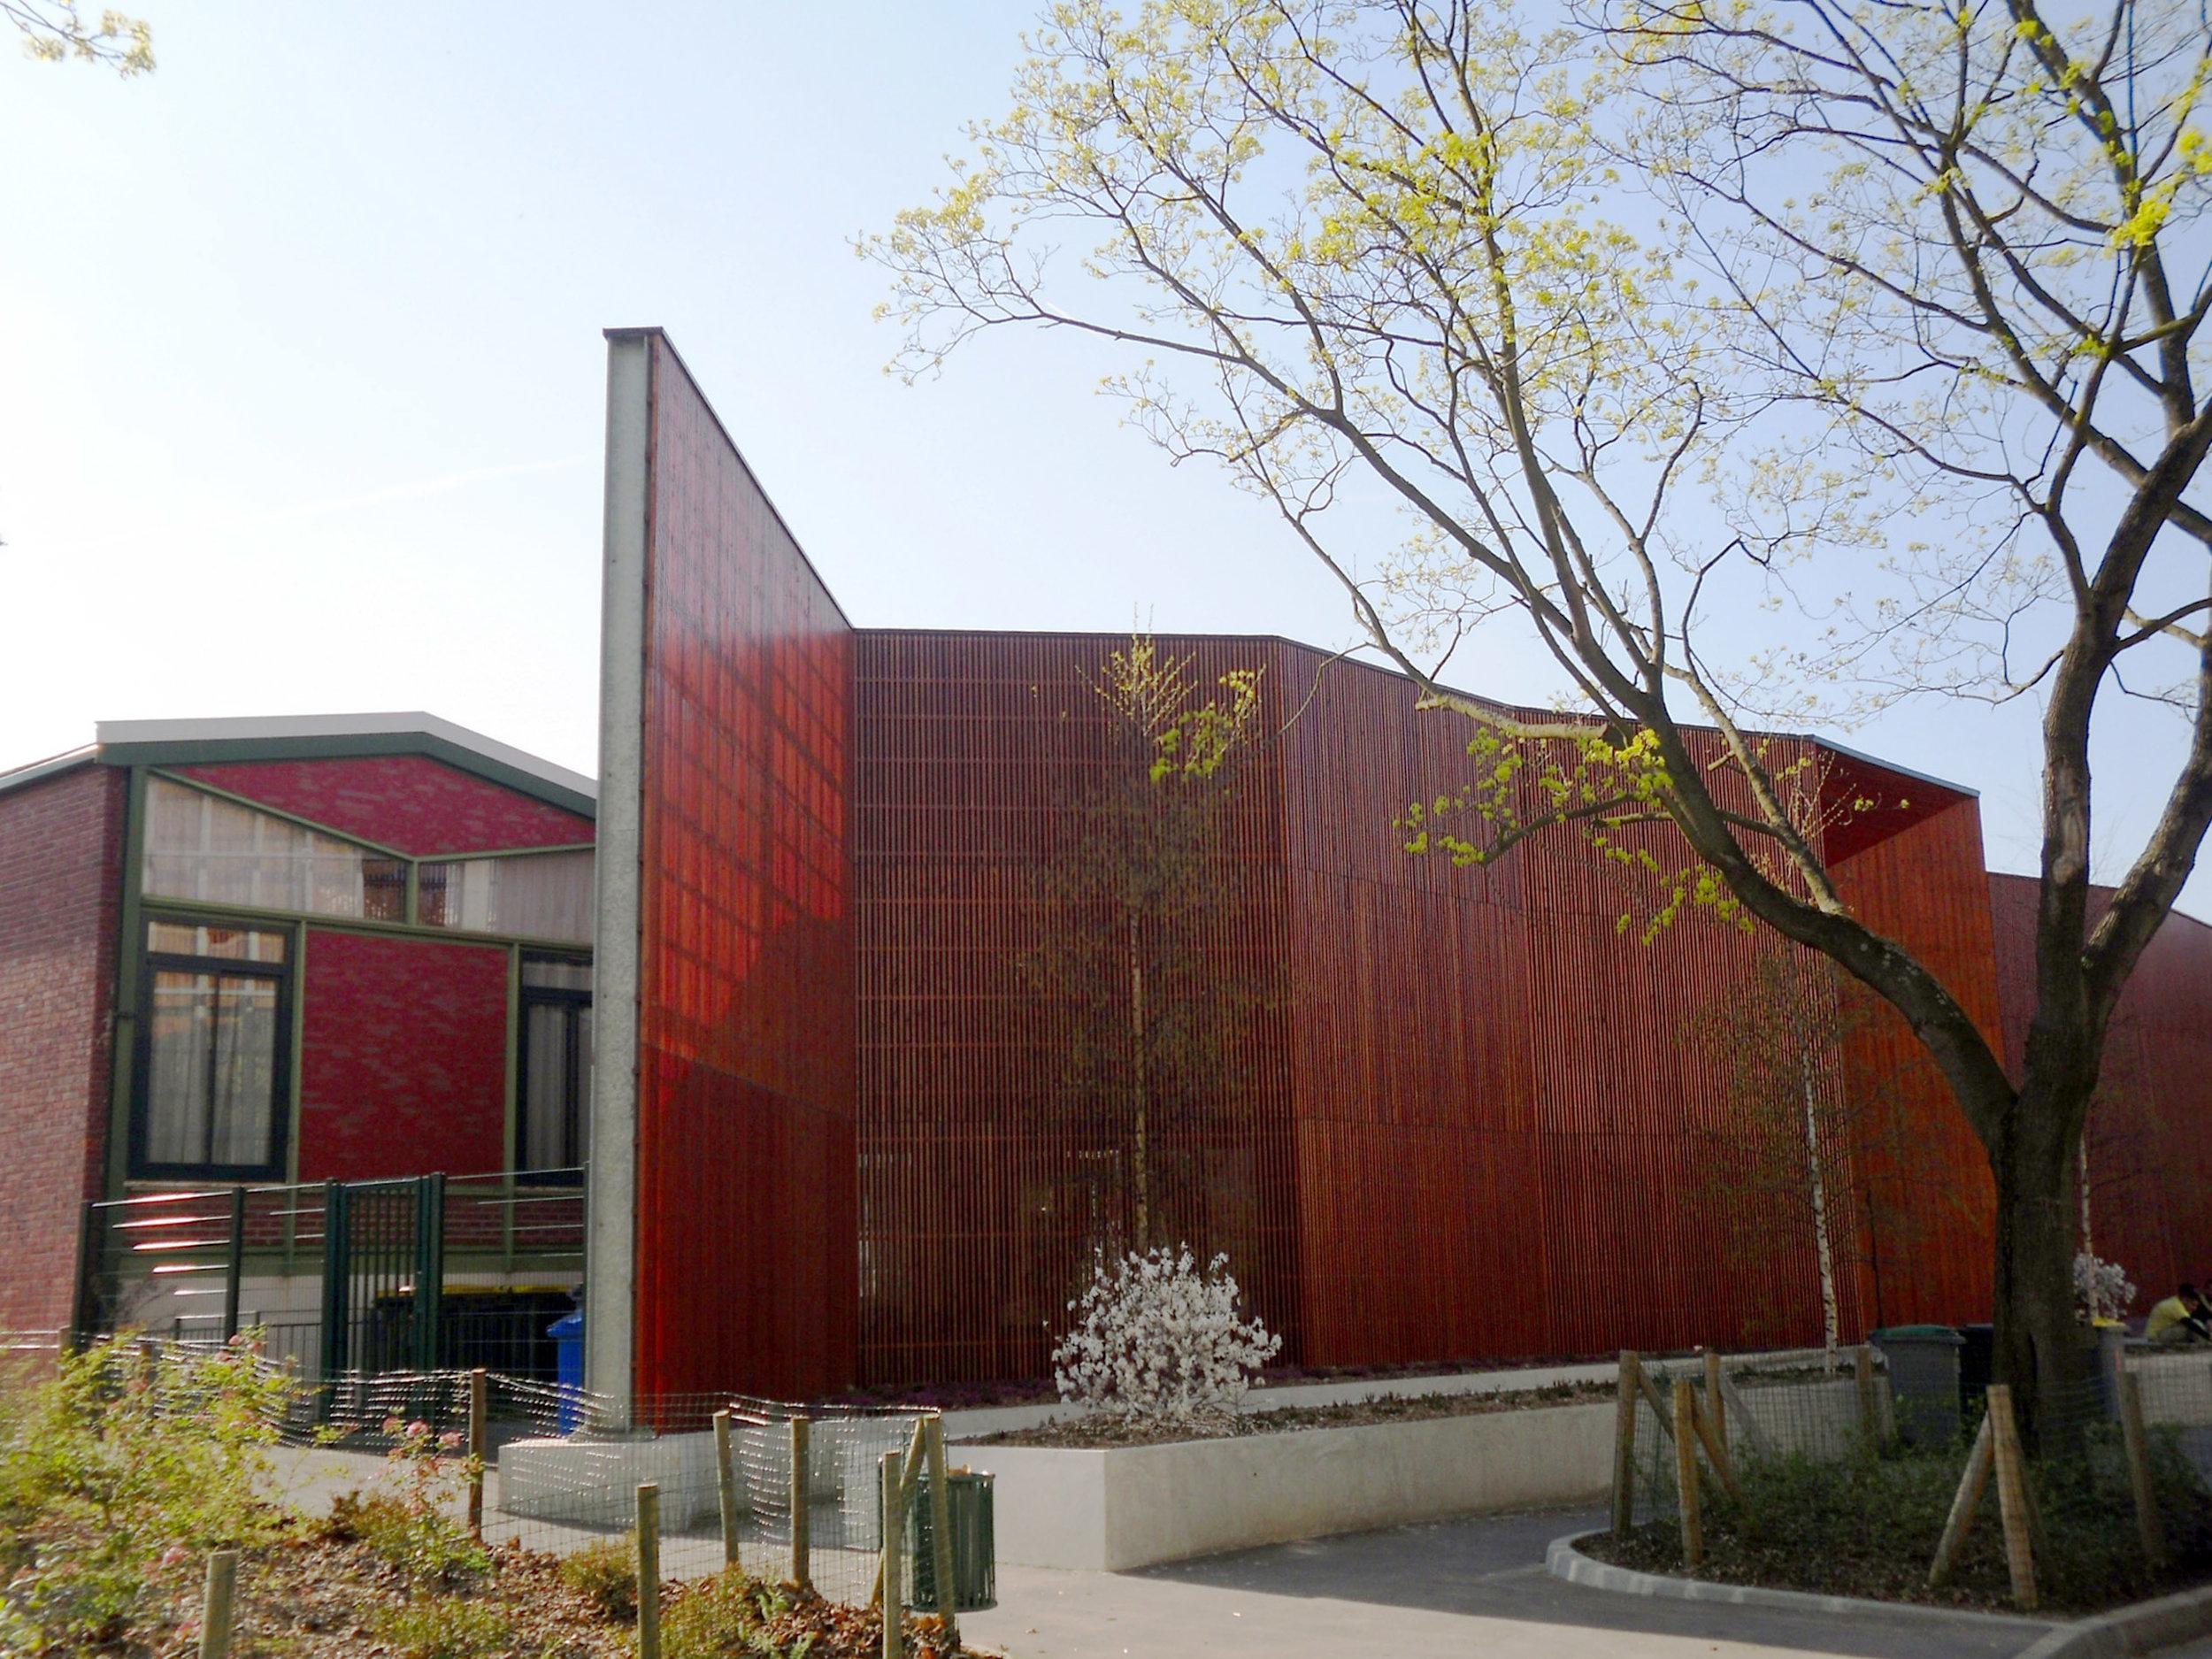 Le centre culturel Paul Bailliart - Massy